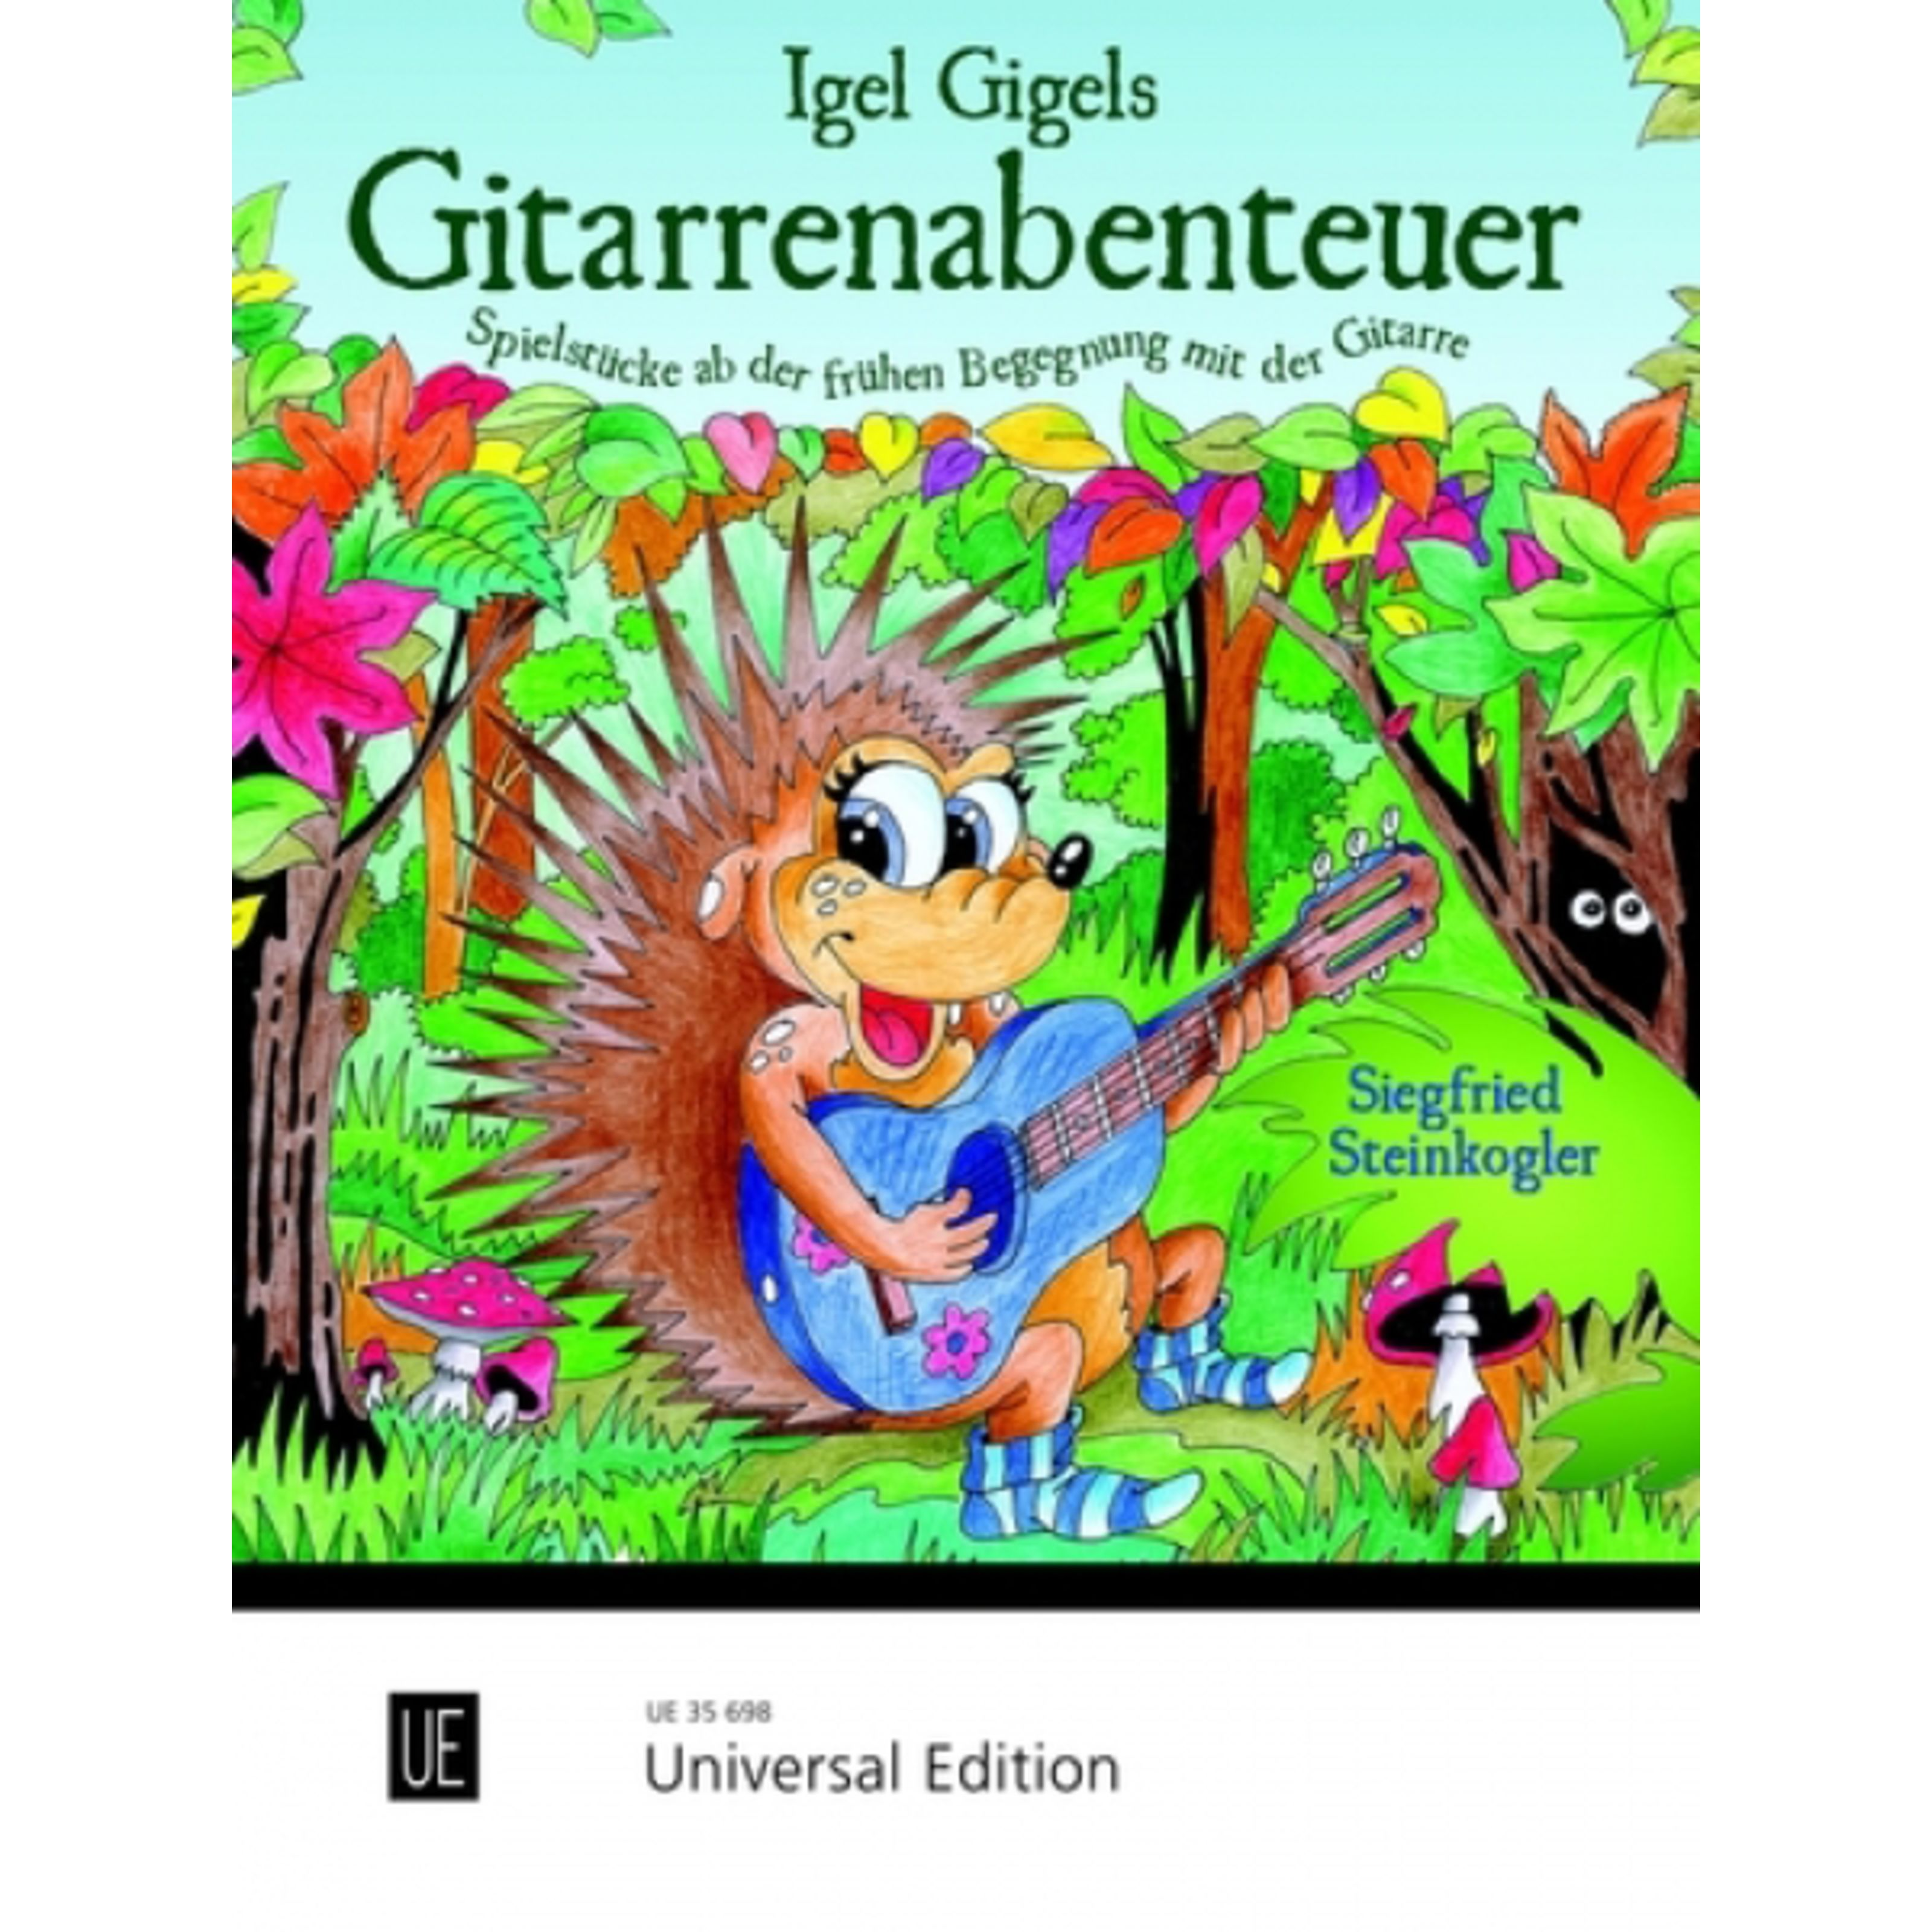 Universal Edition - Igel Gigels Gitarrenabenteuer Siegfried Steinkogler, Gitarre UE 35698